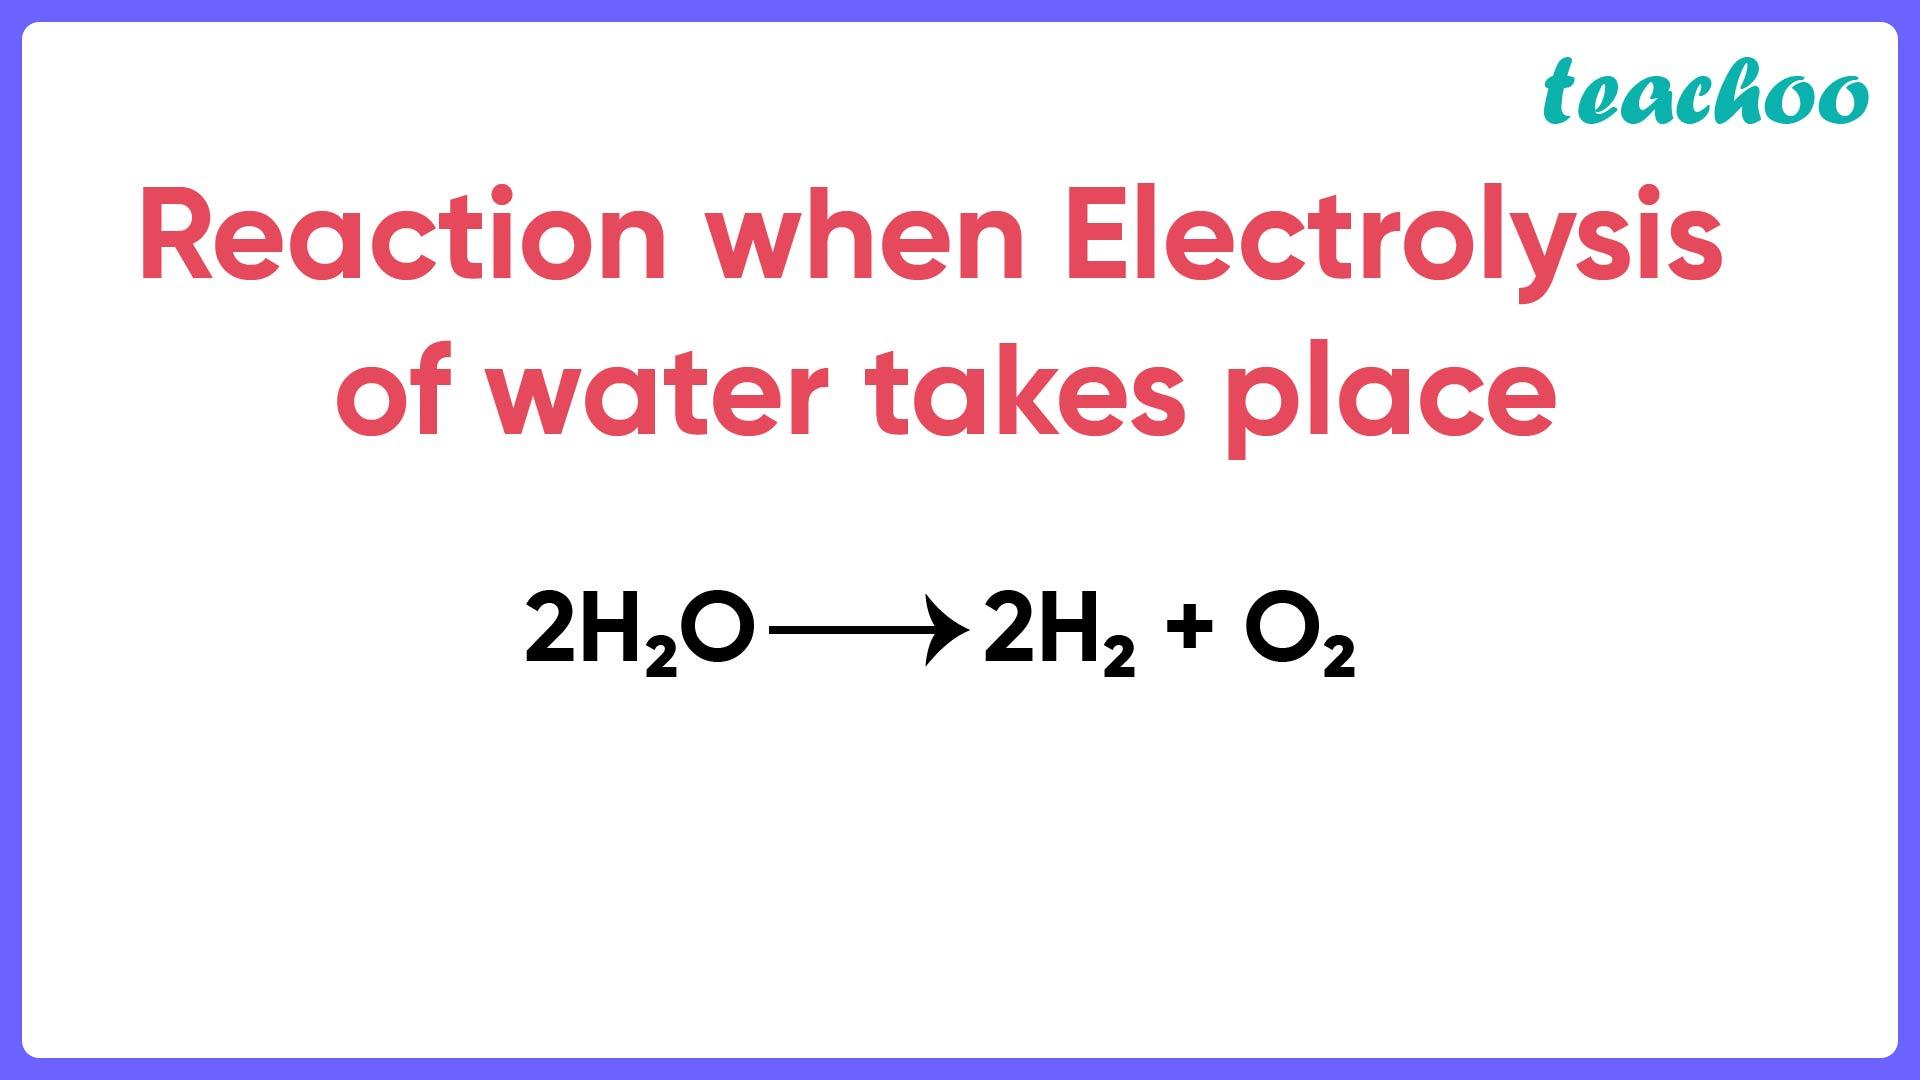 Reaction when Electrolysis of water takes place - Teachoo.jpg